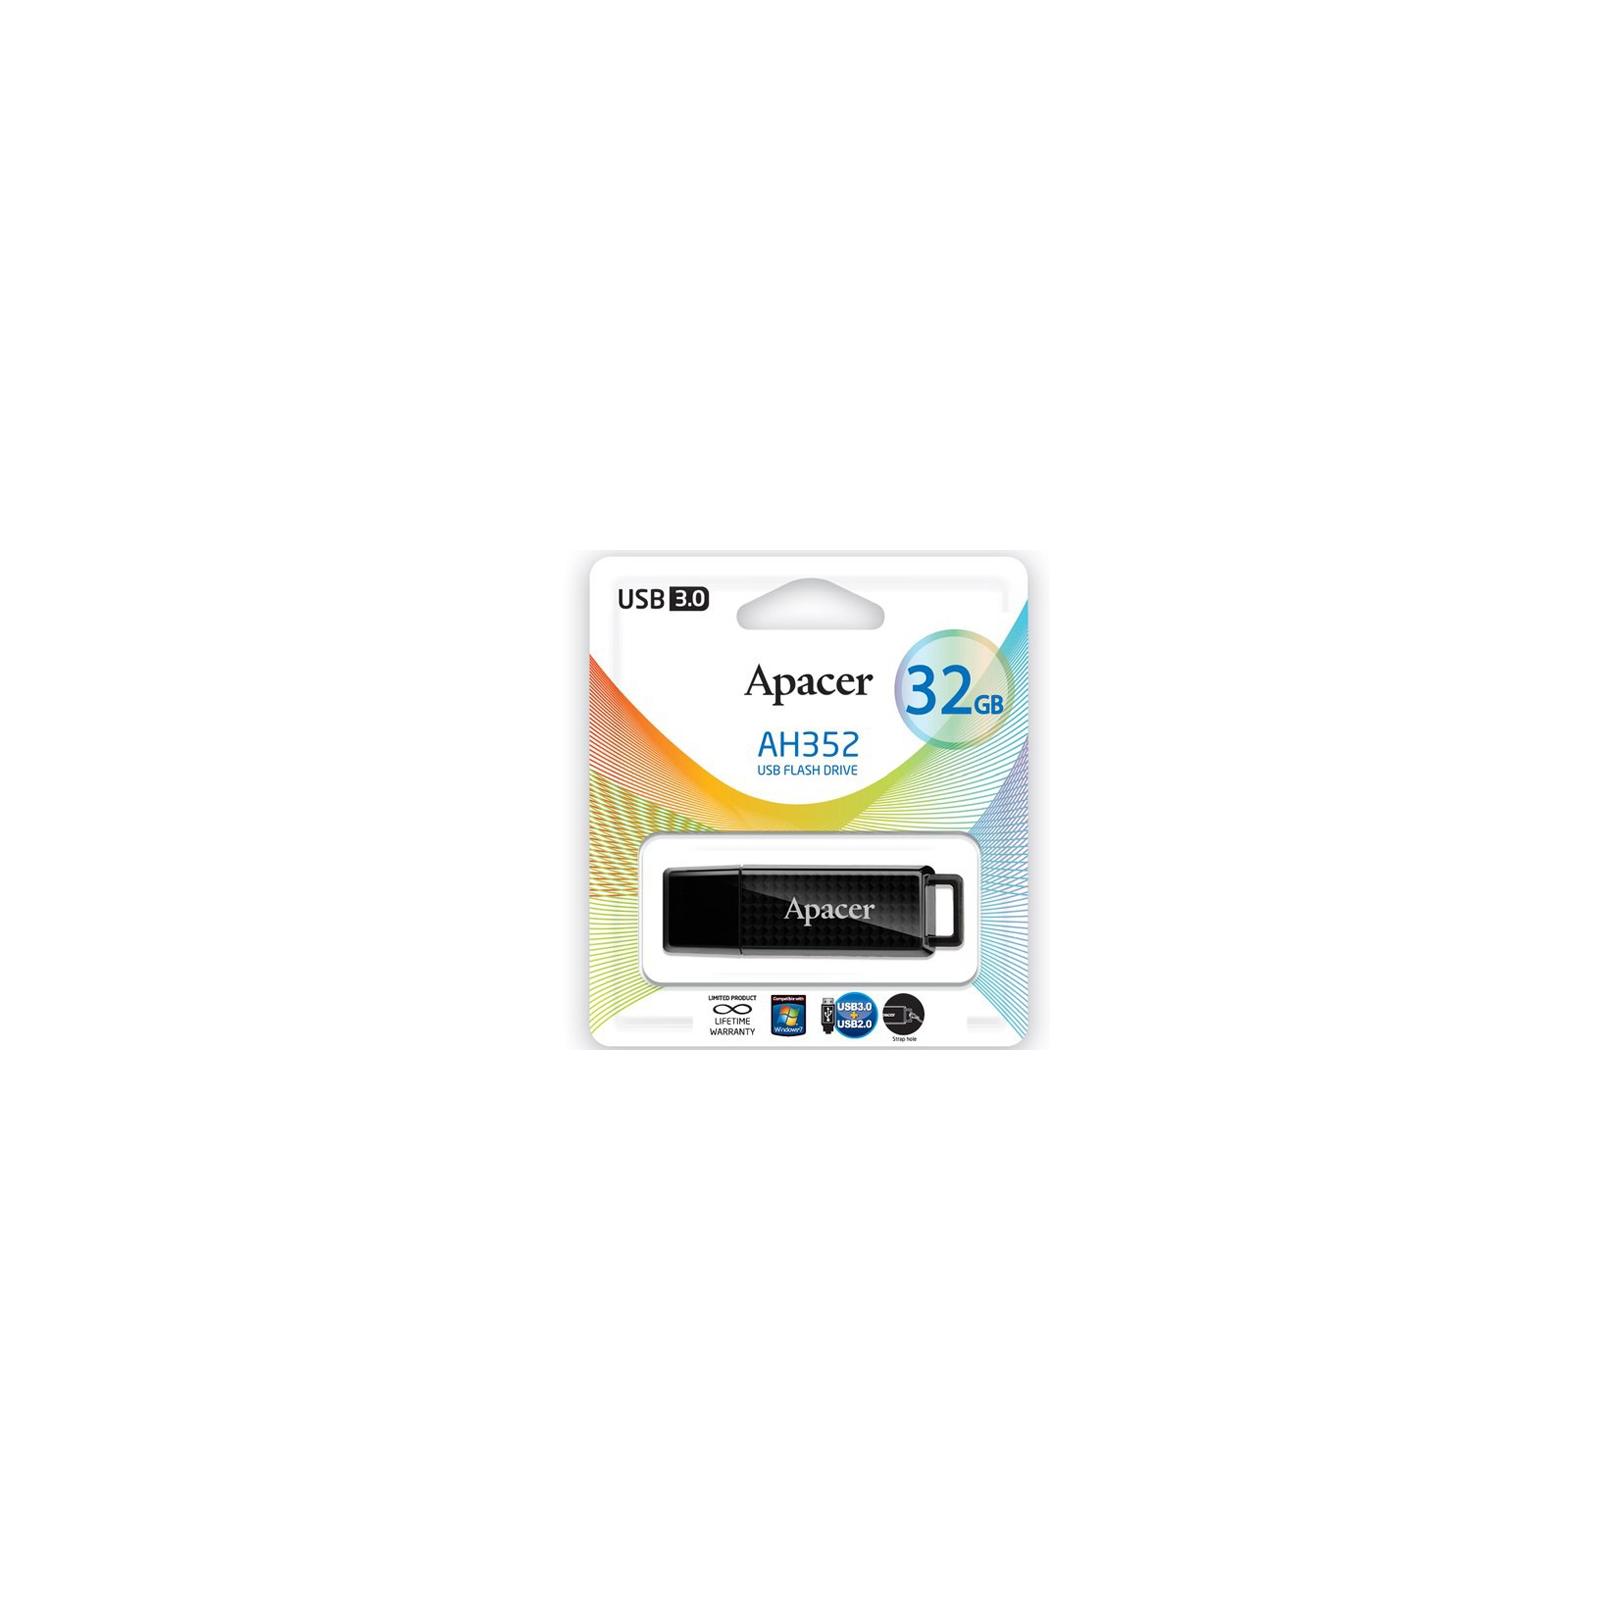 USB флеш накопитель 32GB AH352 Black RP USB3.0 Apacer (AP32GAH352B-1) изображение 6